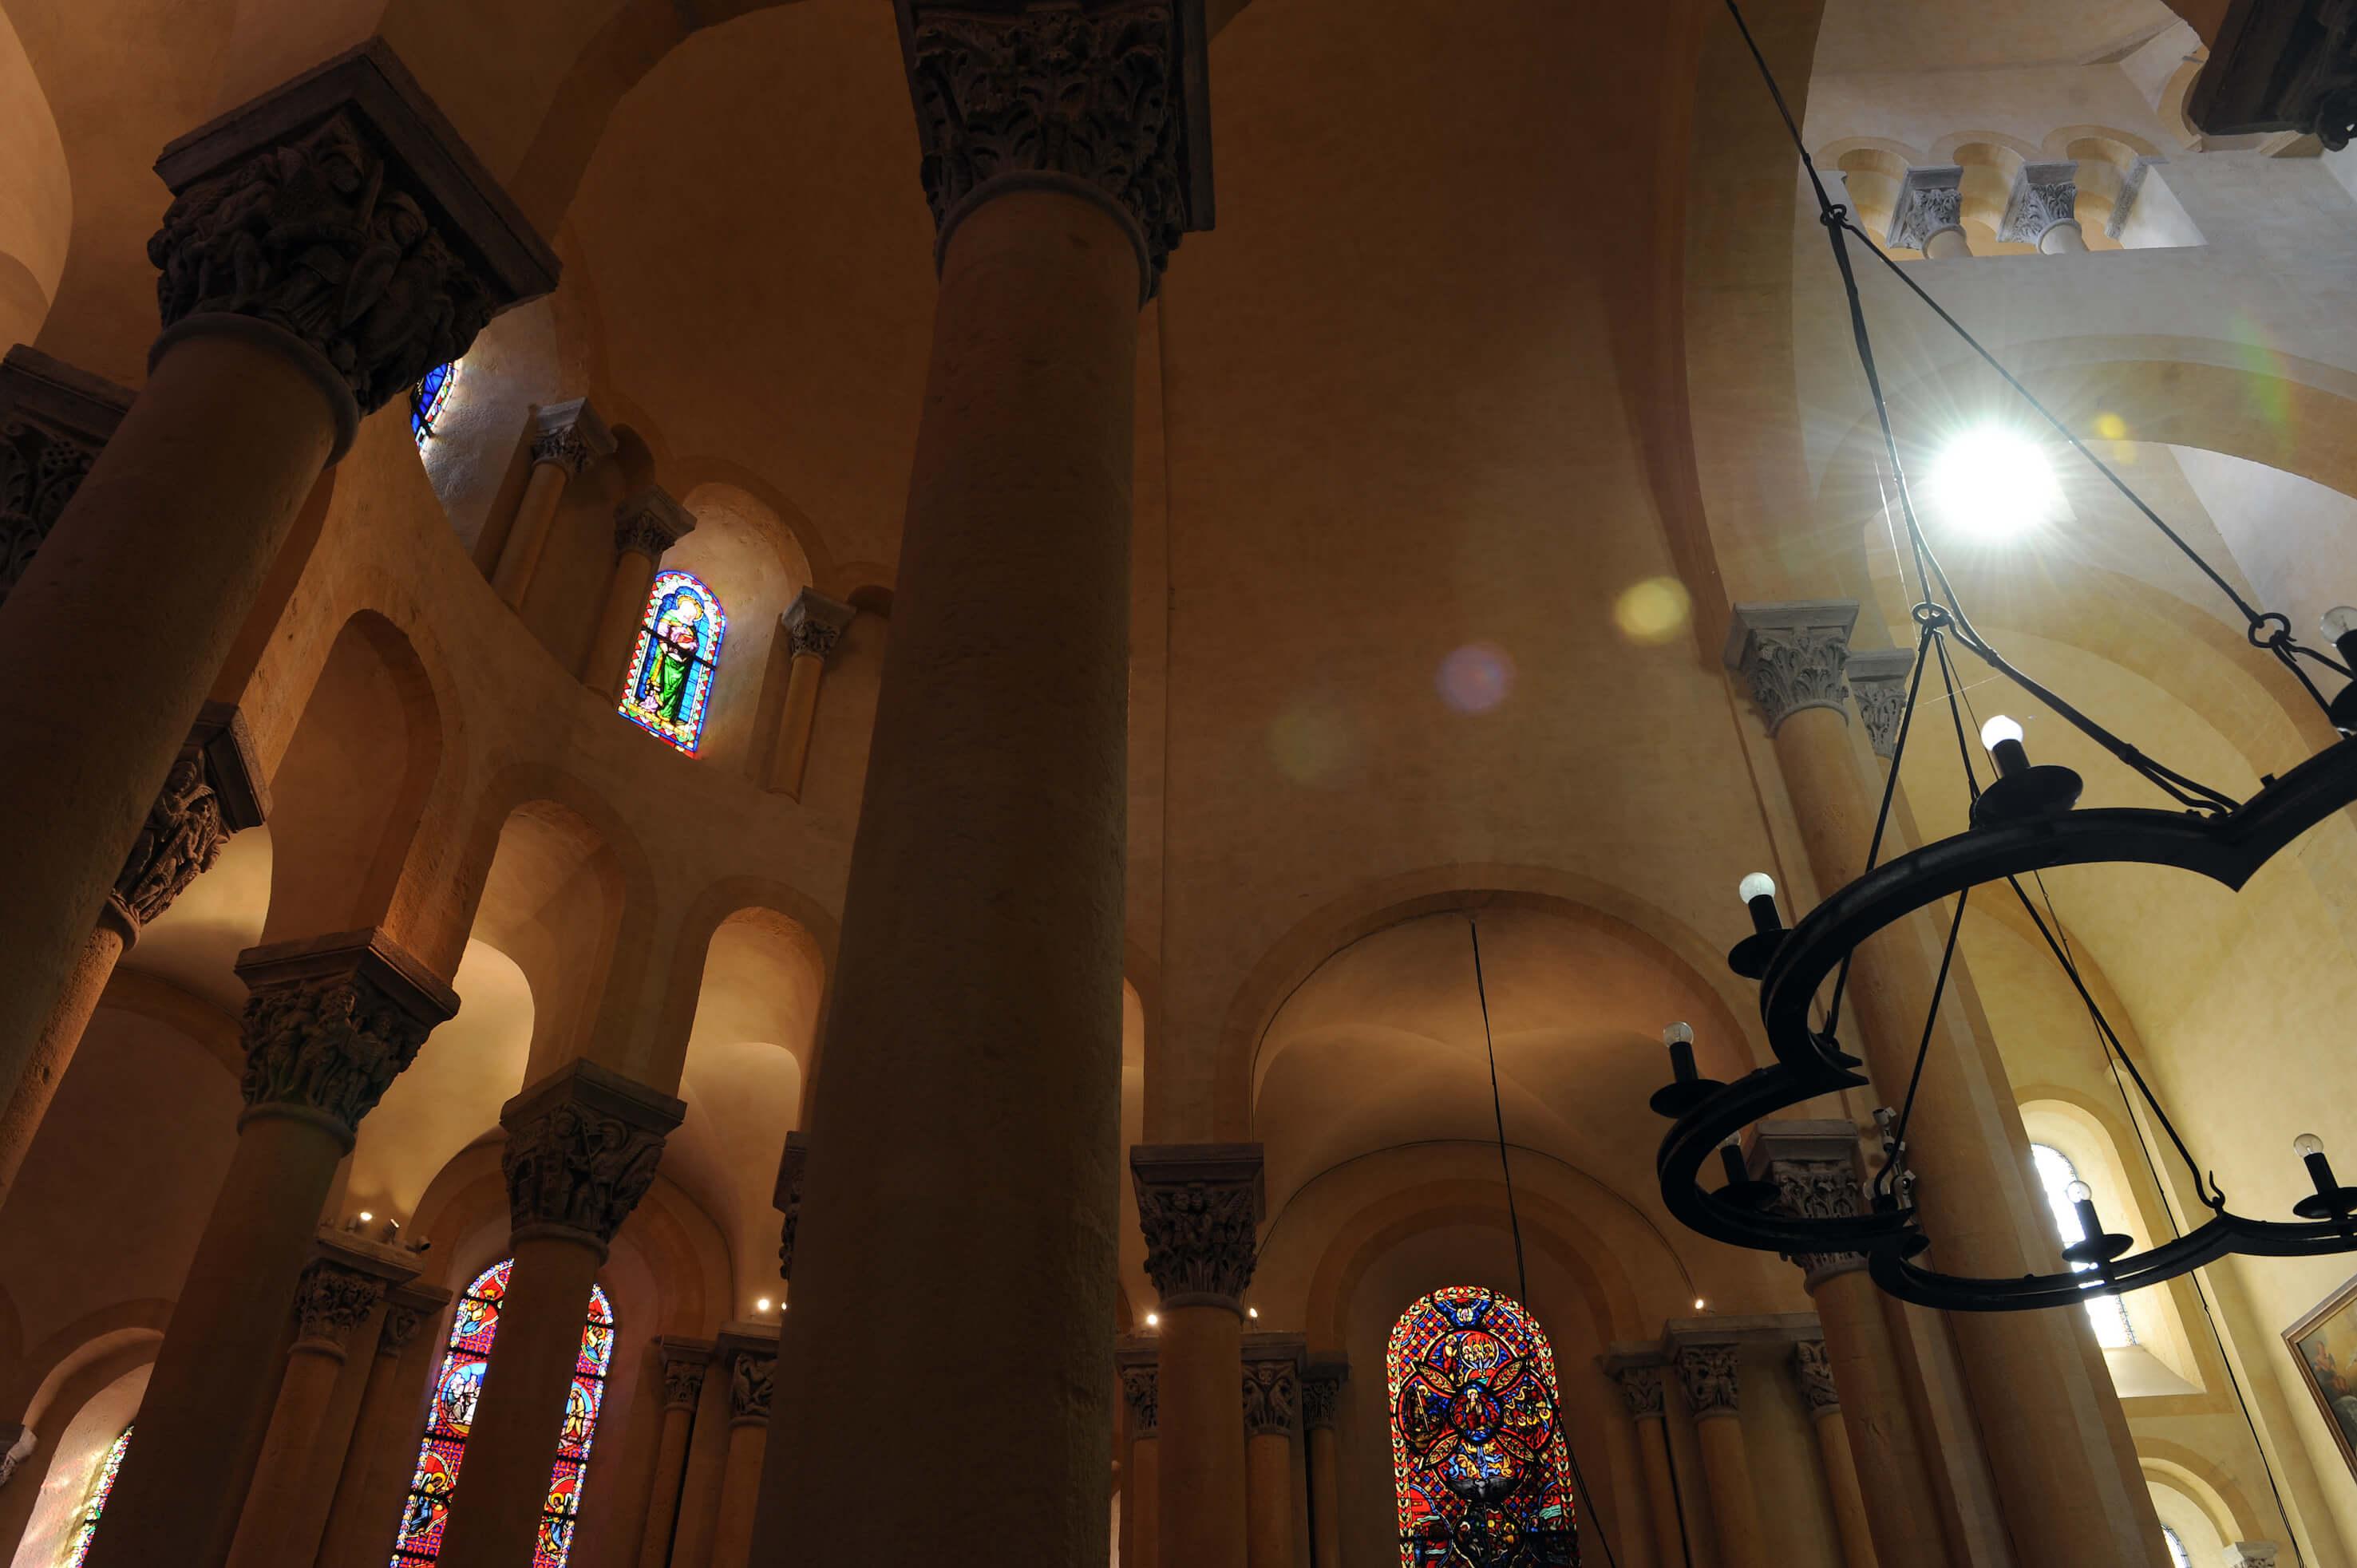 Basilique Notre-Dame-du-Port©ACIR / JJ Gelbart